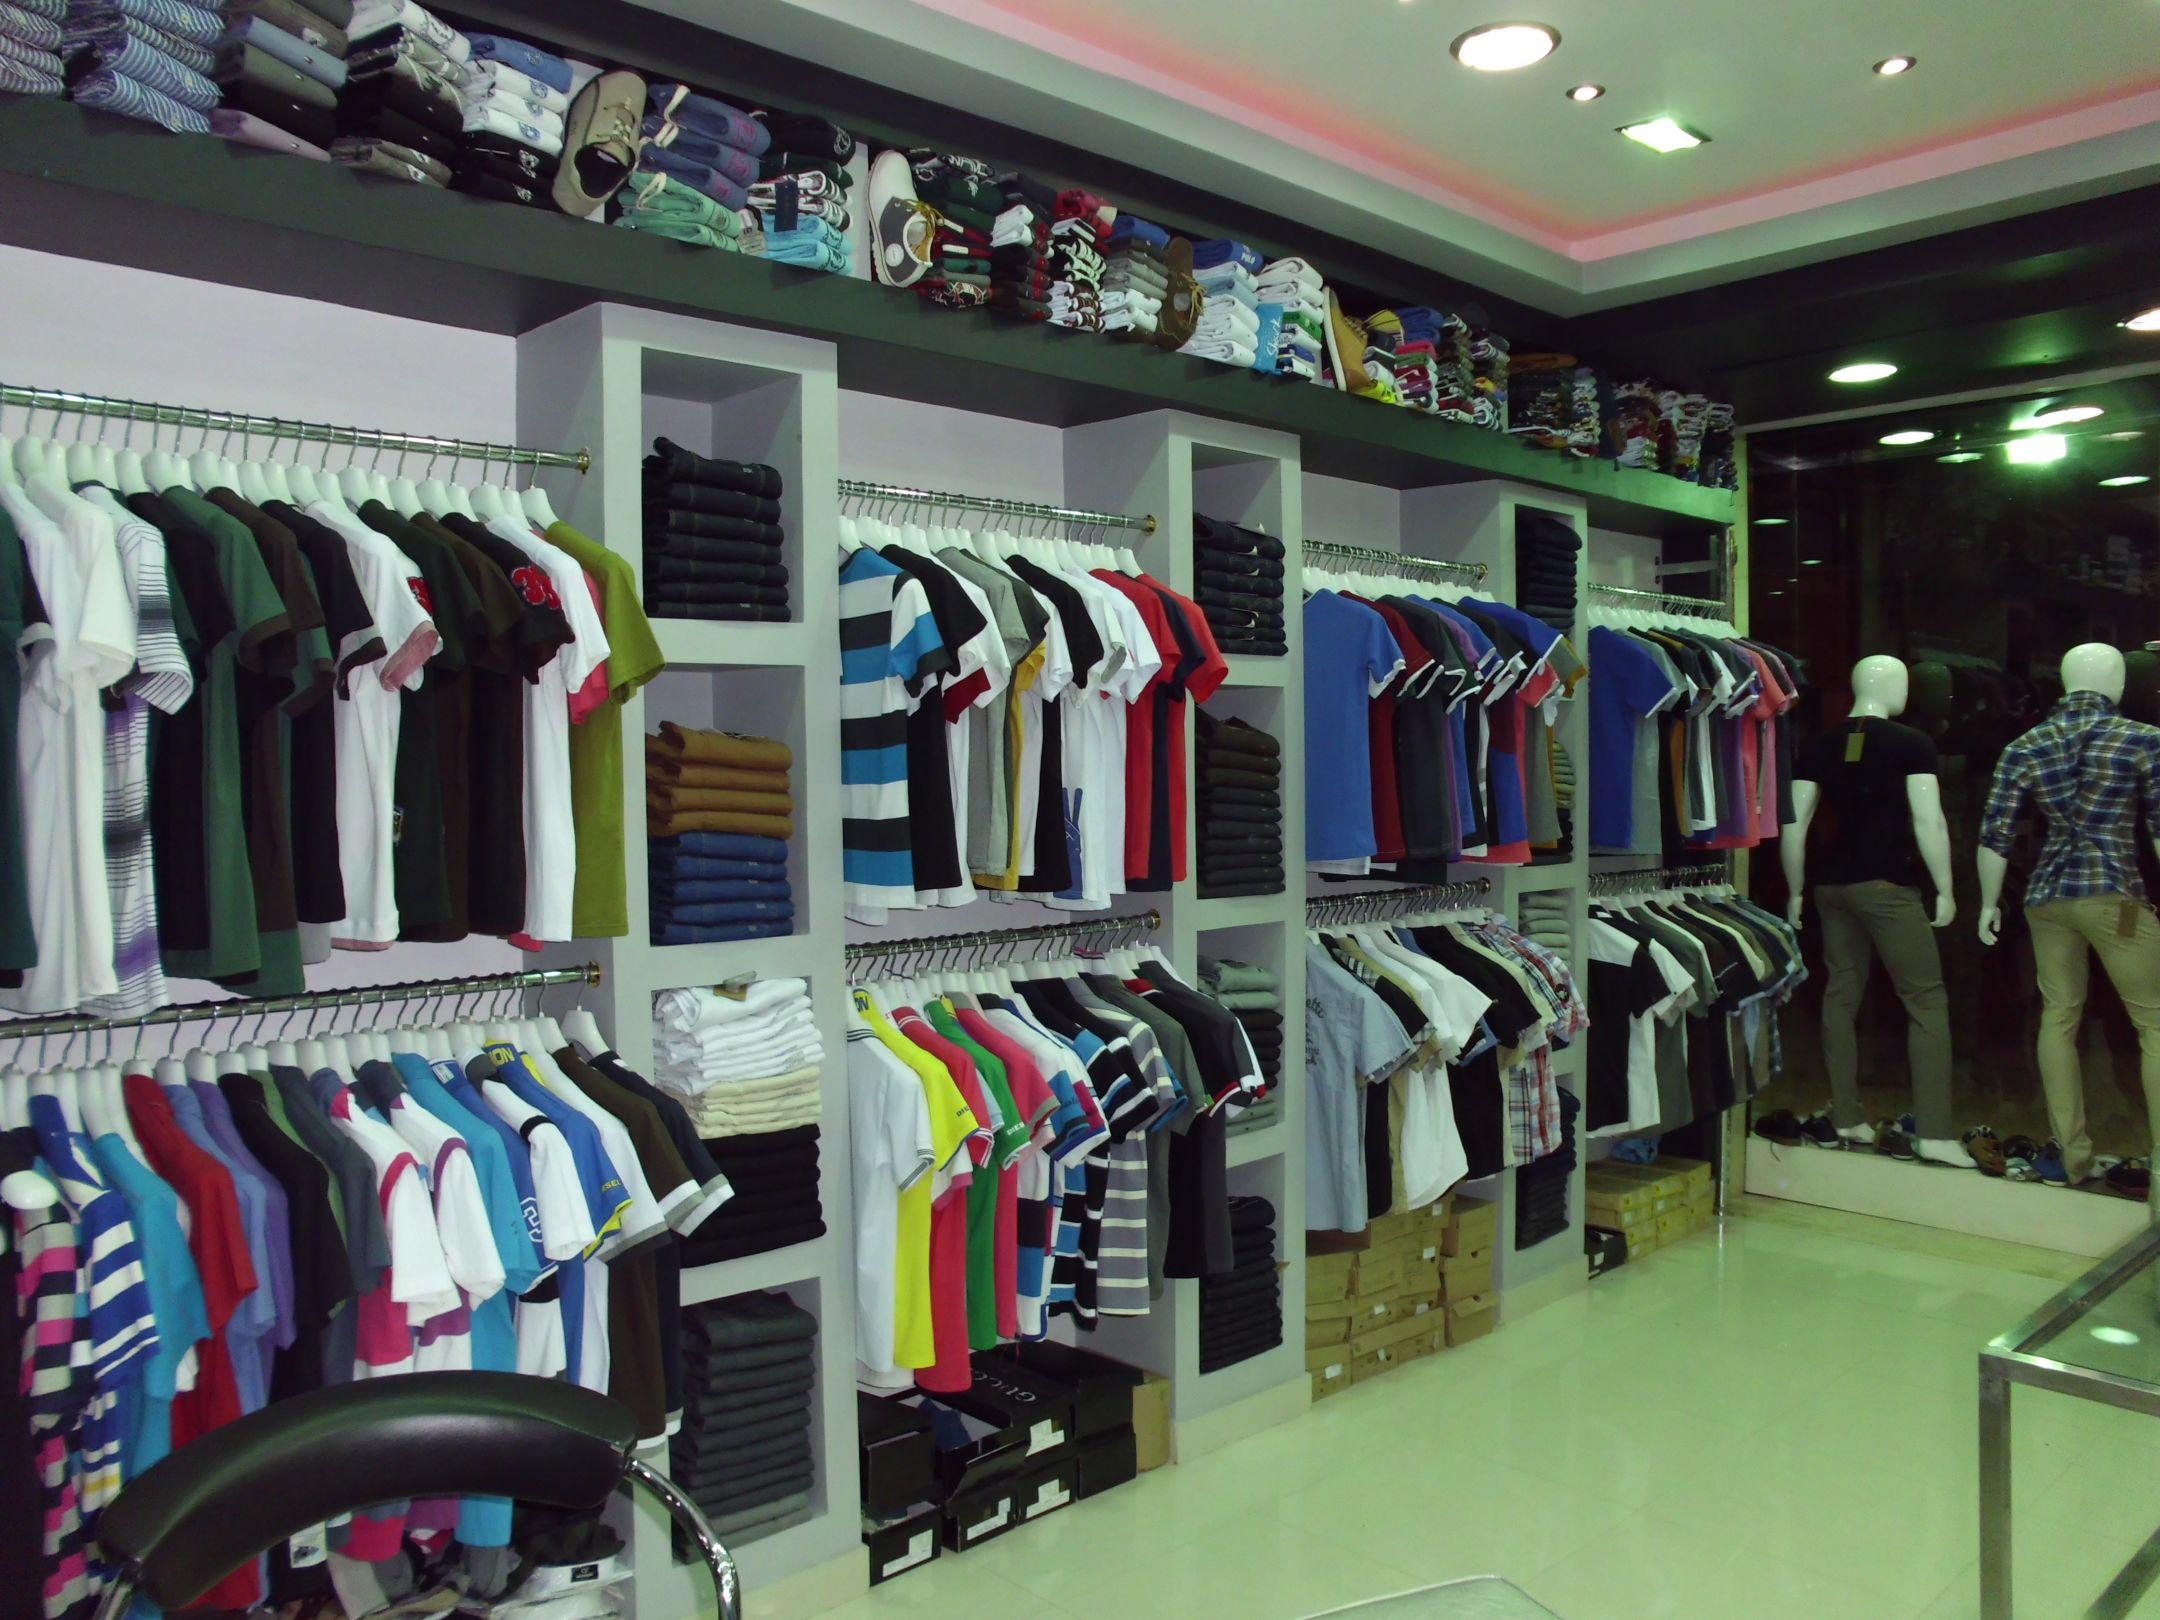 بالصور محلات ملابس , تعرف على احدث موديلات ملابس بالمحلات 1939 11